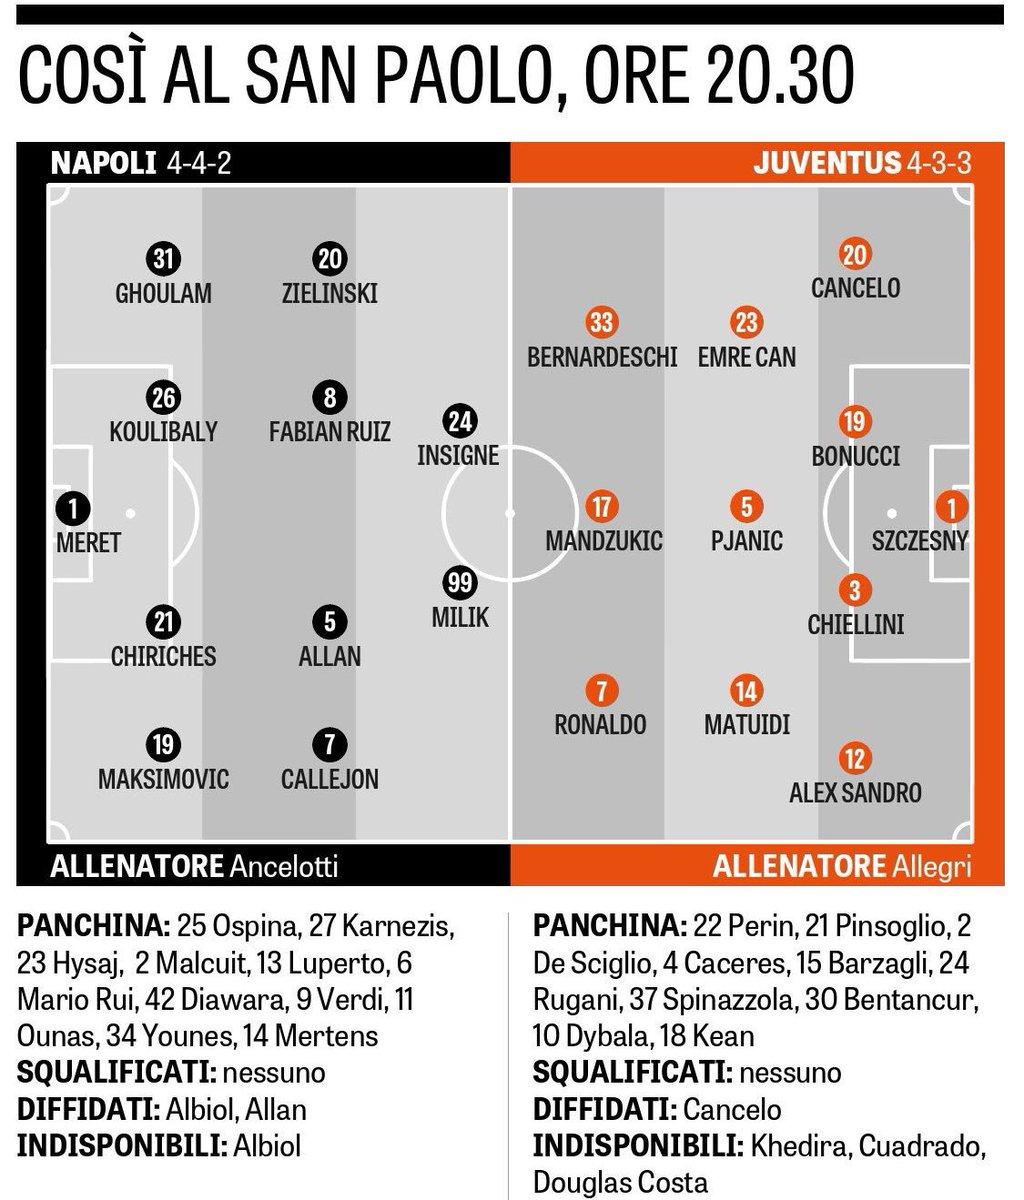 Napoli - Juventus 2019.03.03 20:30 Digi1 - Page 4 D0s7ll10